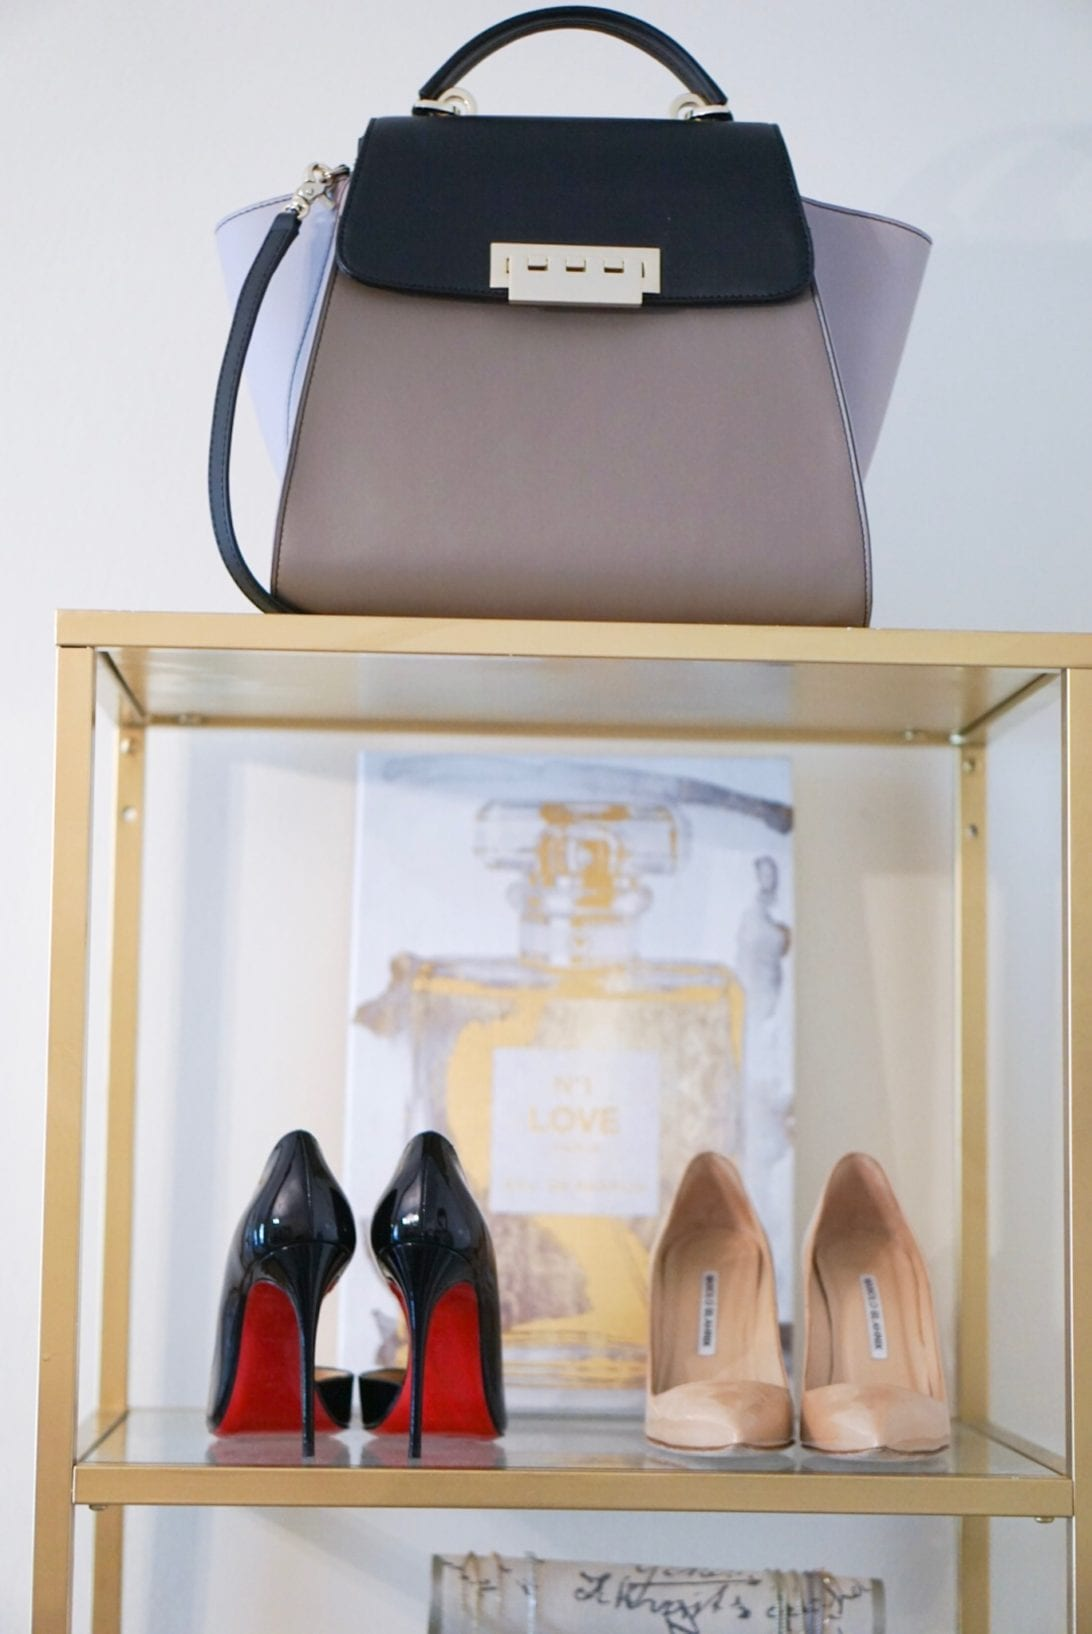 ZAC zac posen bag, christian louboutin shoes, manolo blanik, chanel, wall art, office, shoe display